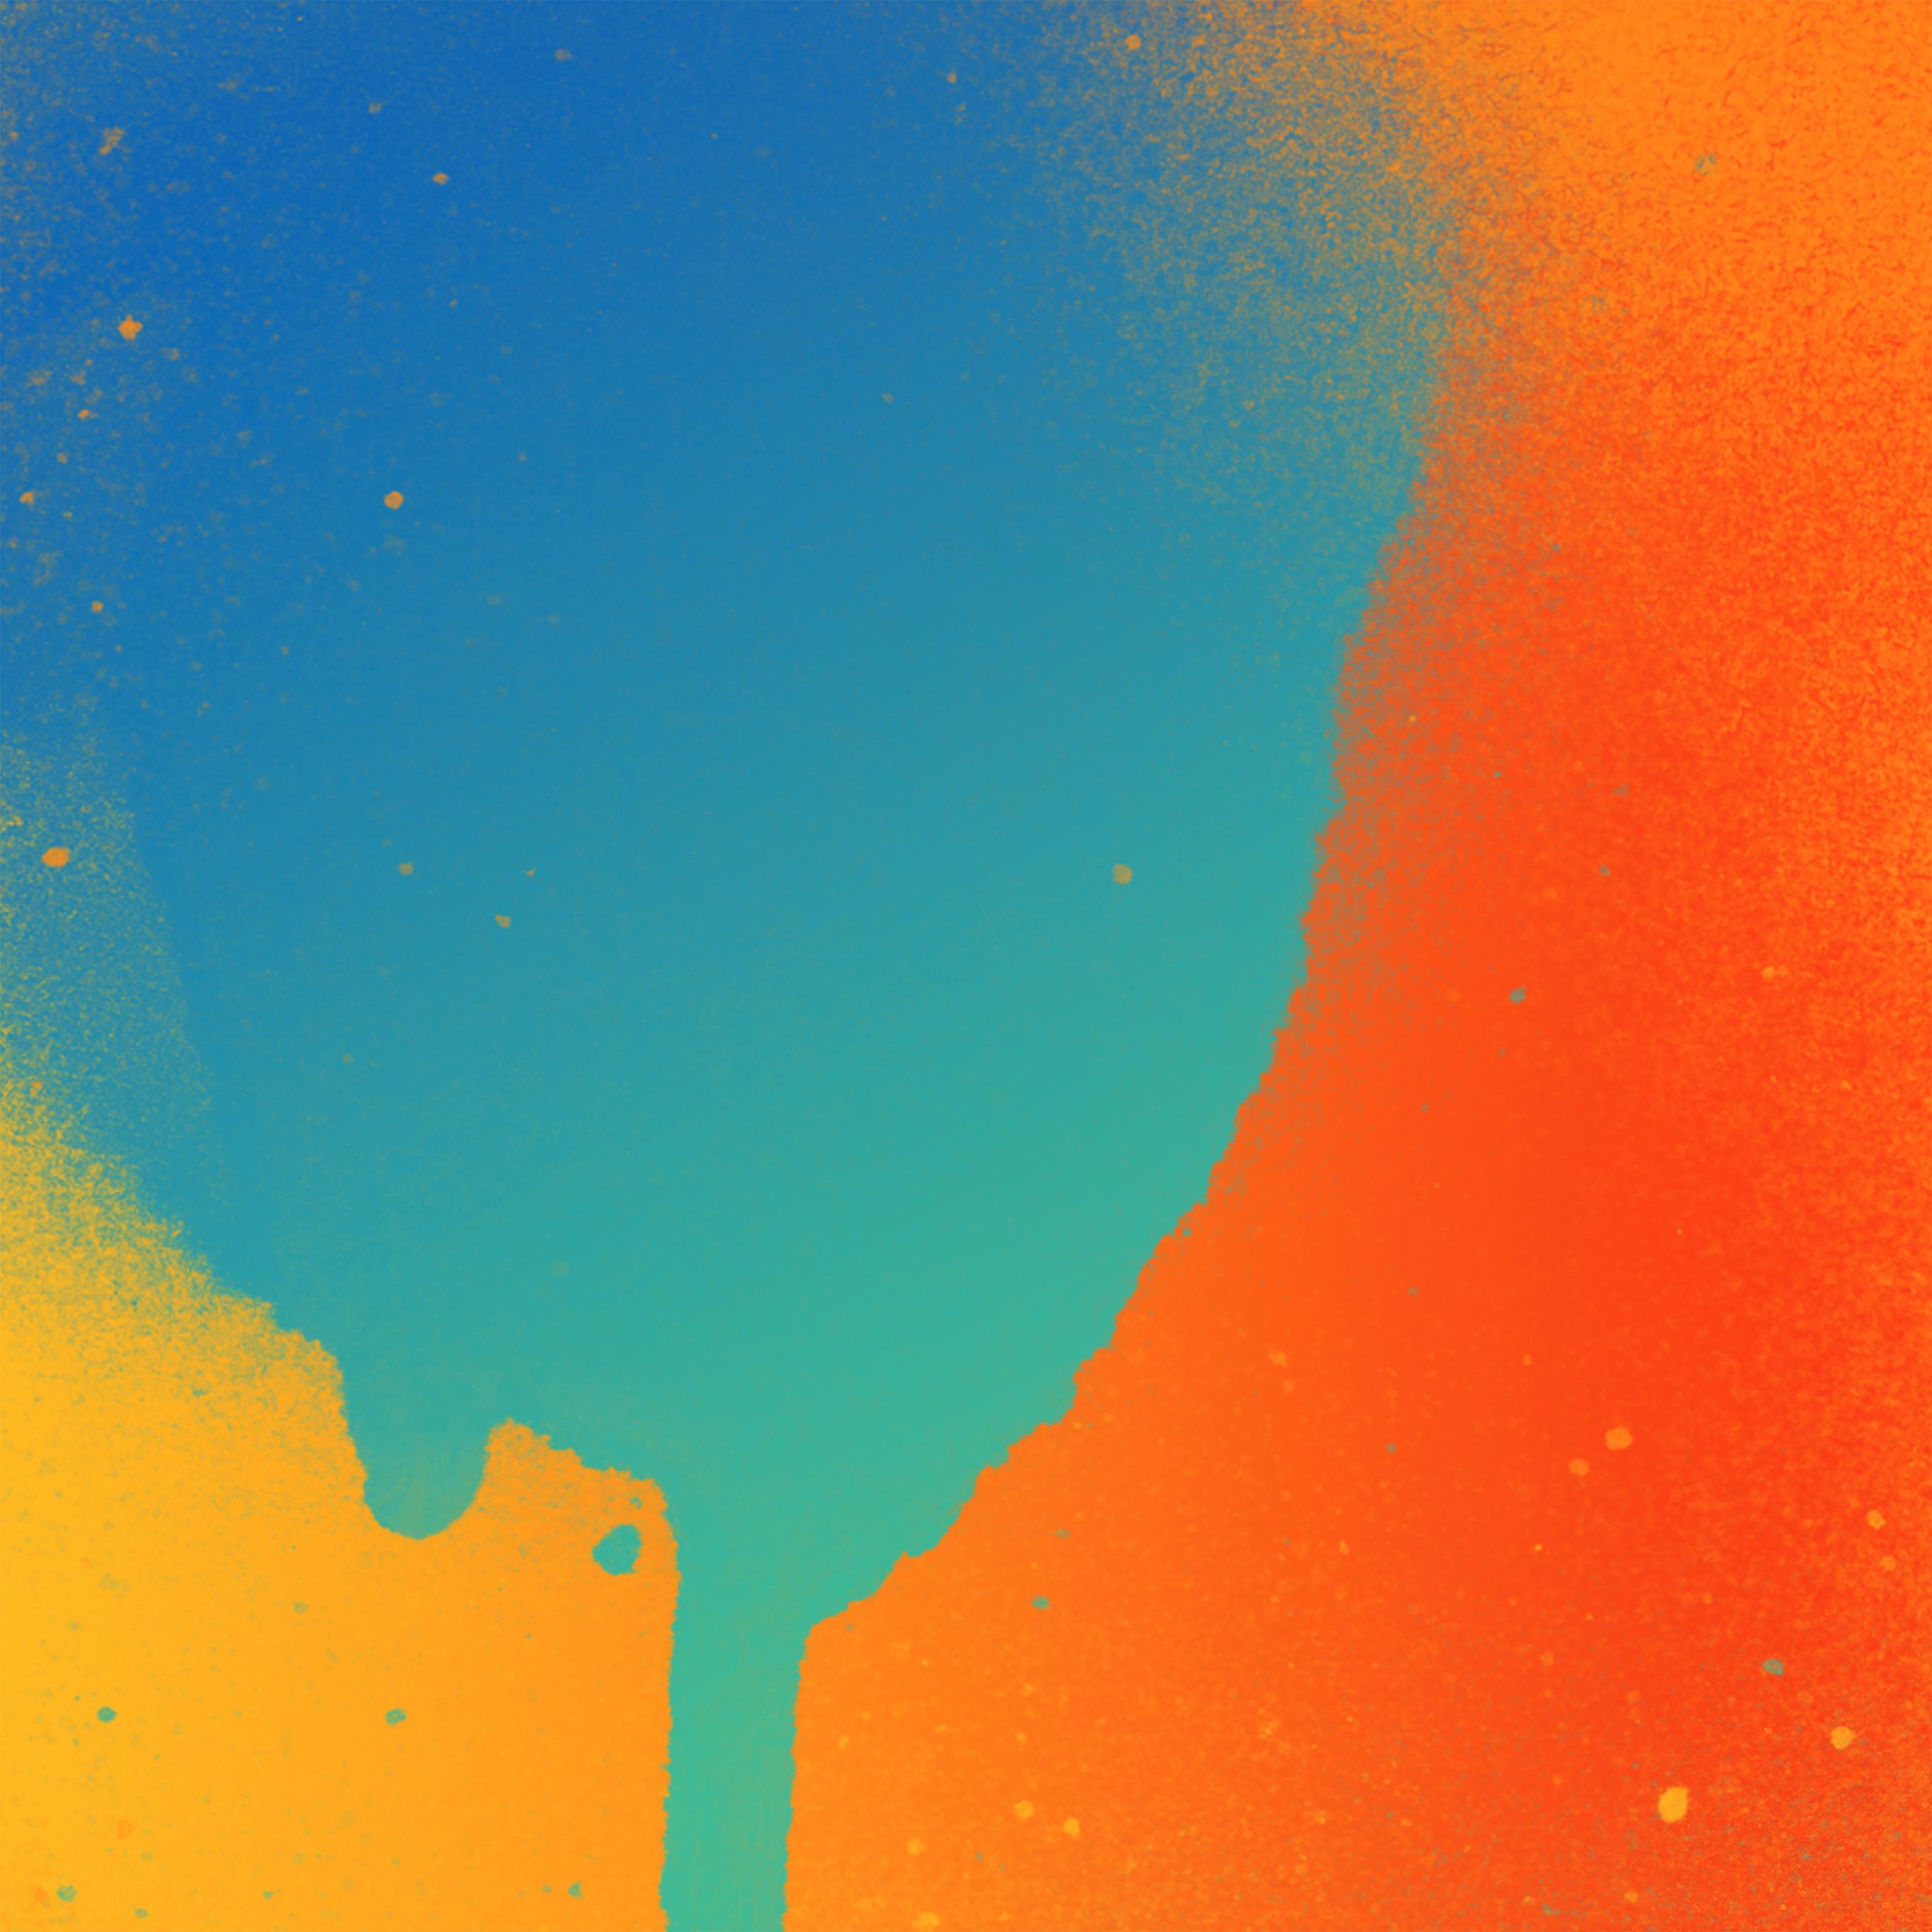 Ab09 Wallpaper Paint Splatter Illust Art By Suapp